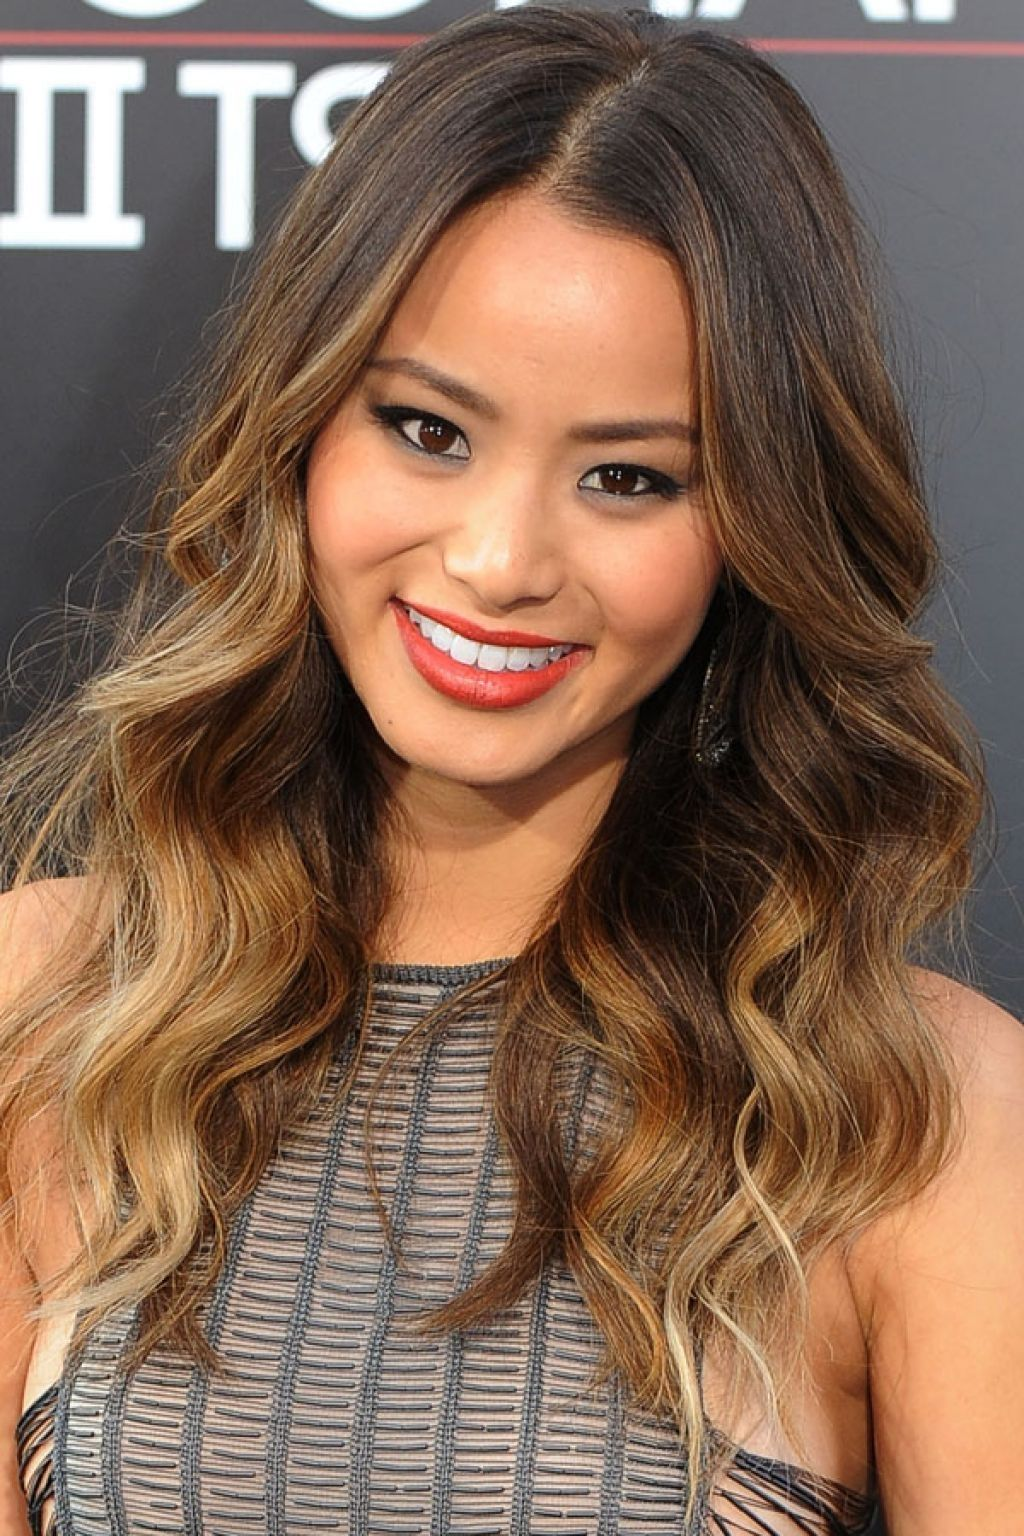 Hair Color For Asian Skin Tones Blonde Hair For Asian Skin Tone Hair Color Asian Hair Color For Tan Skin Hair Color For Black Hair